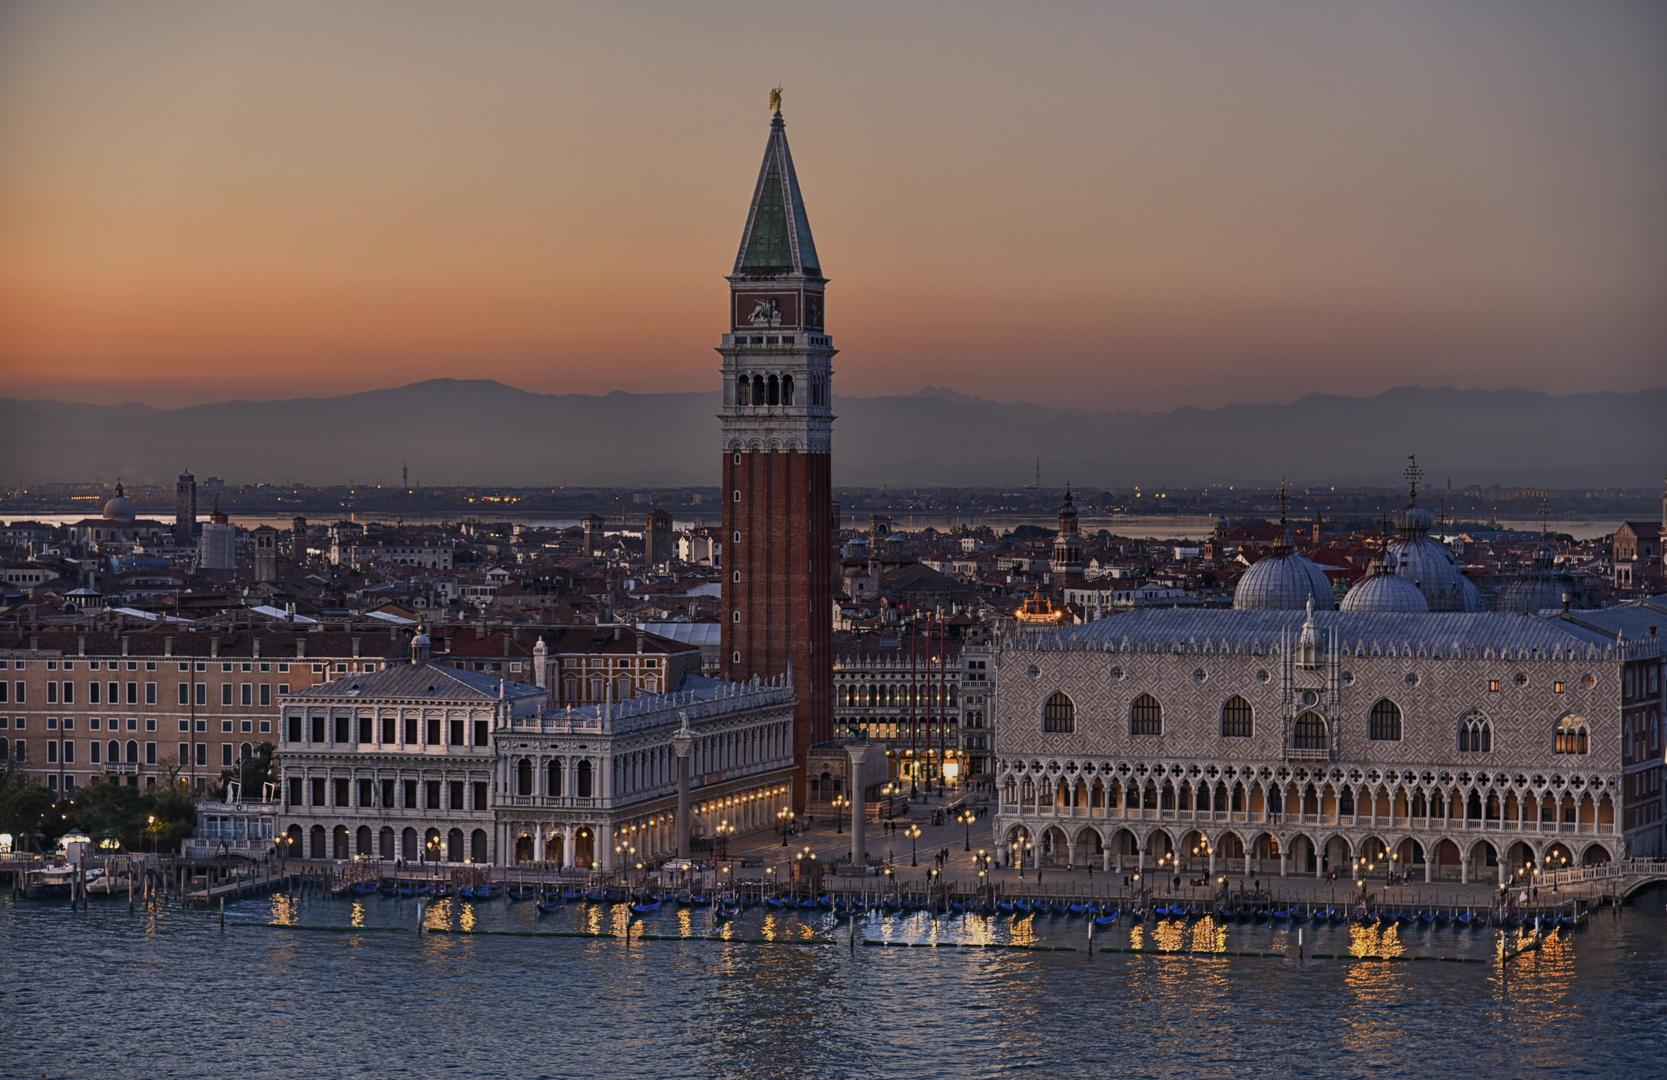 Piazza San Marco zauberhafter Novembertag 2020